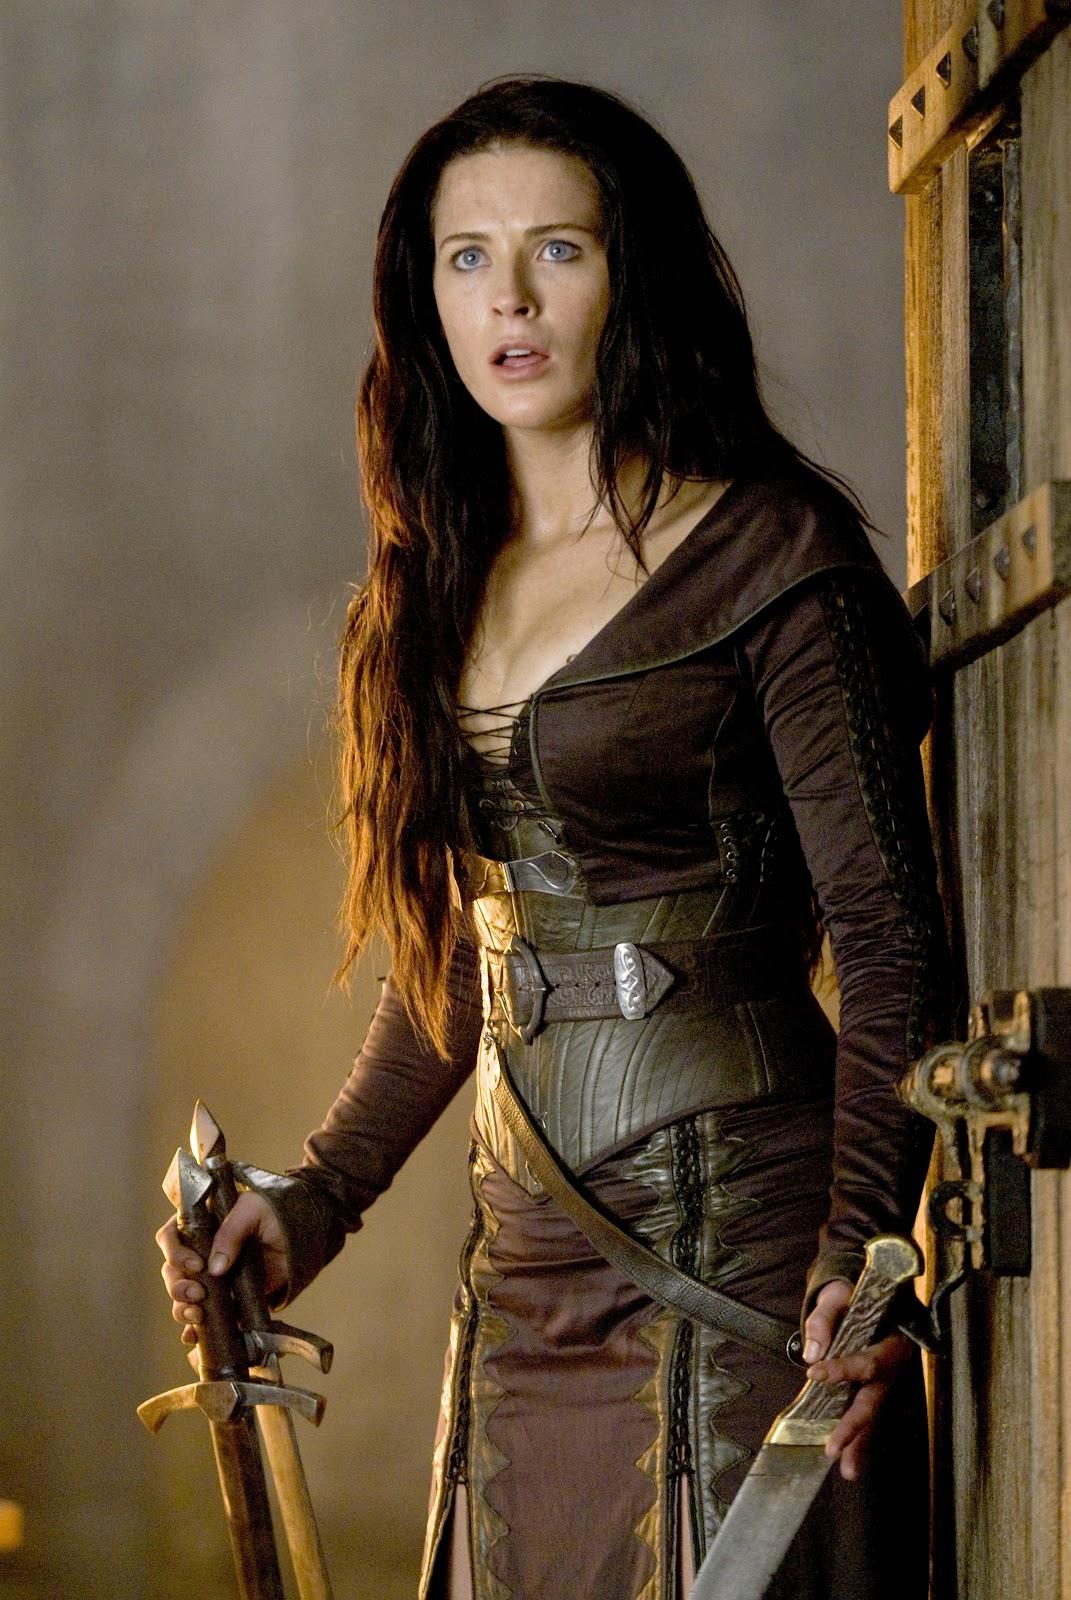 Celebrities, Movies and Games: Bridget Regan as Kahlan ...